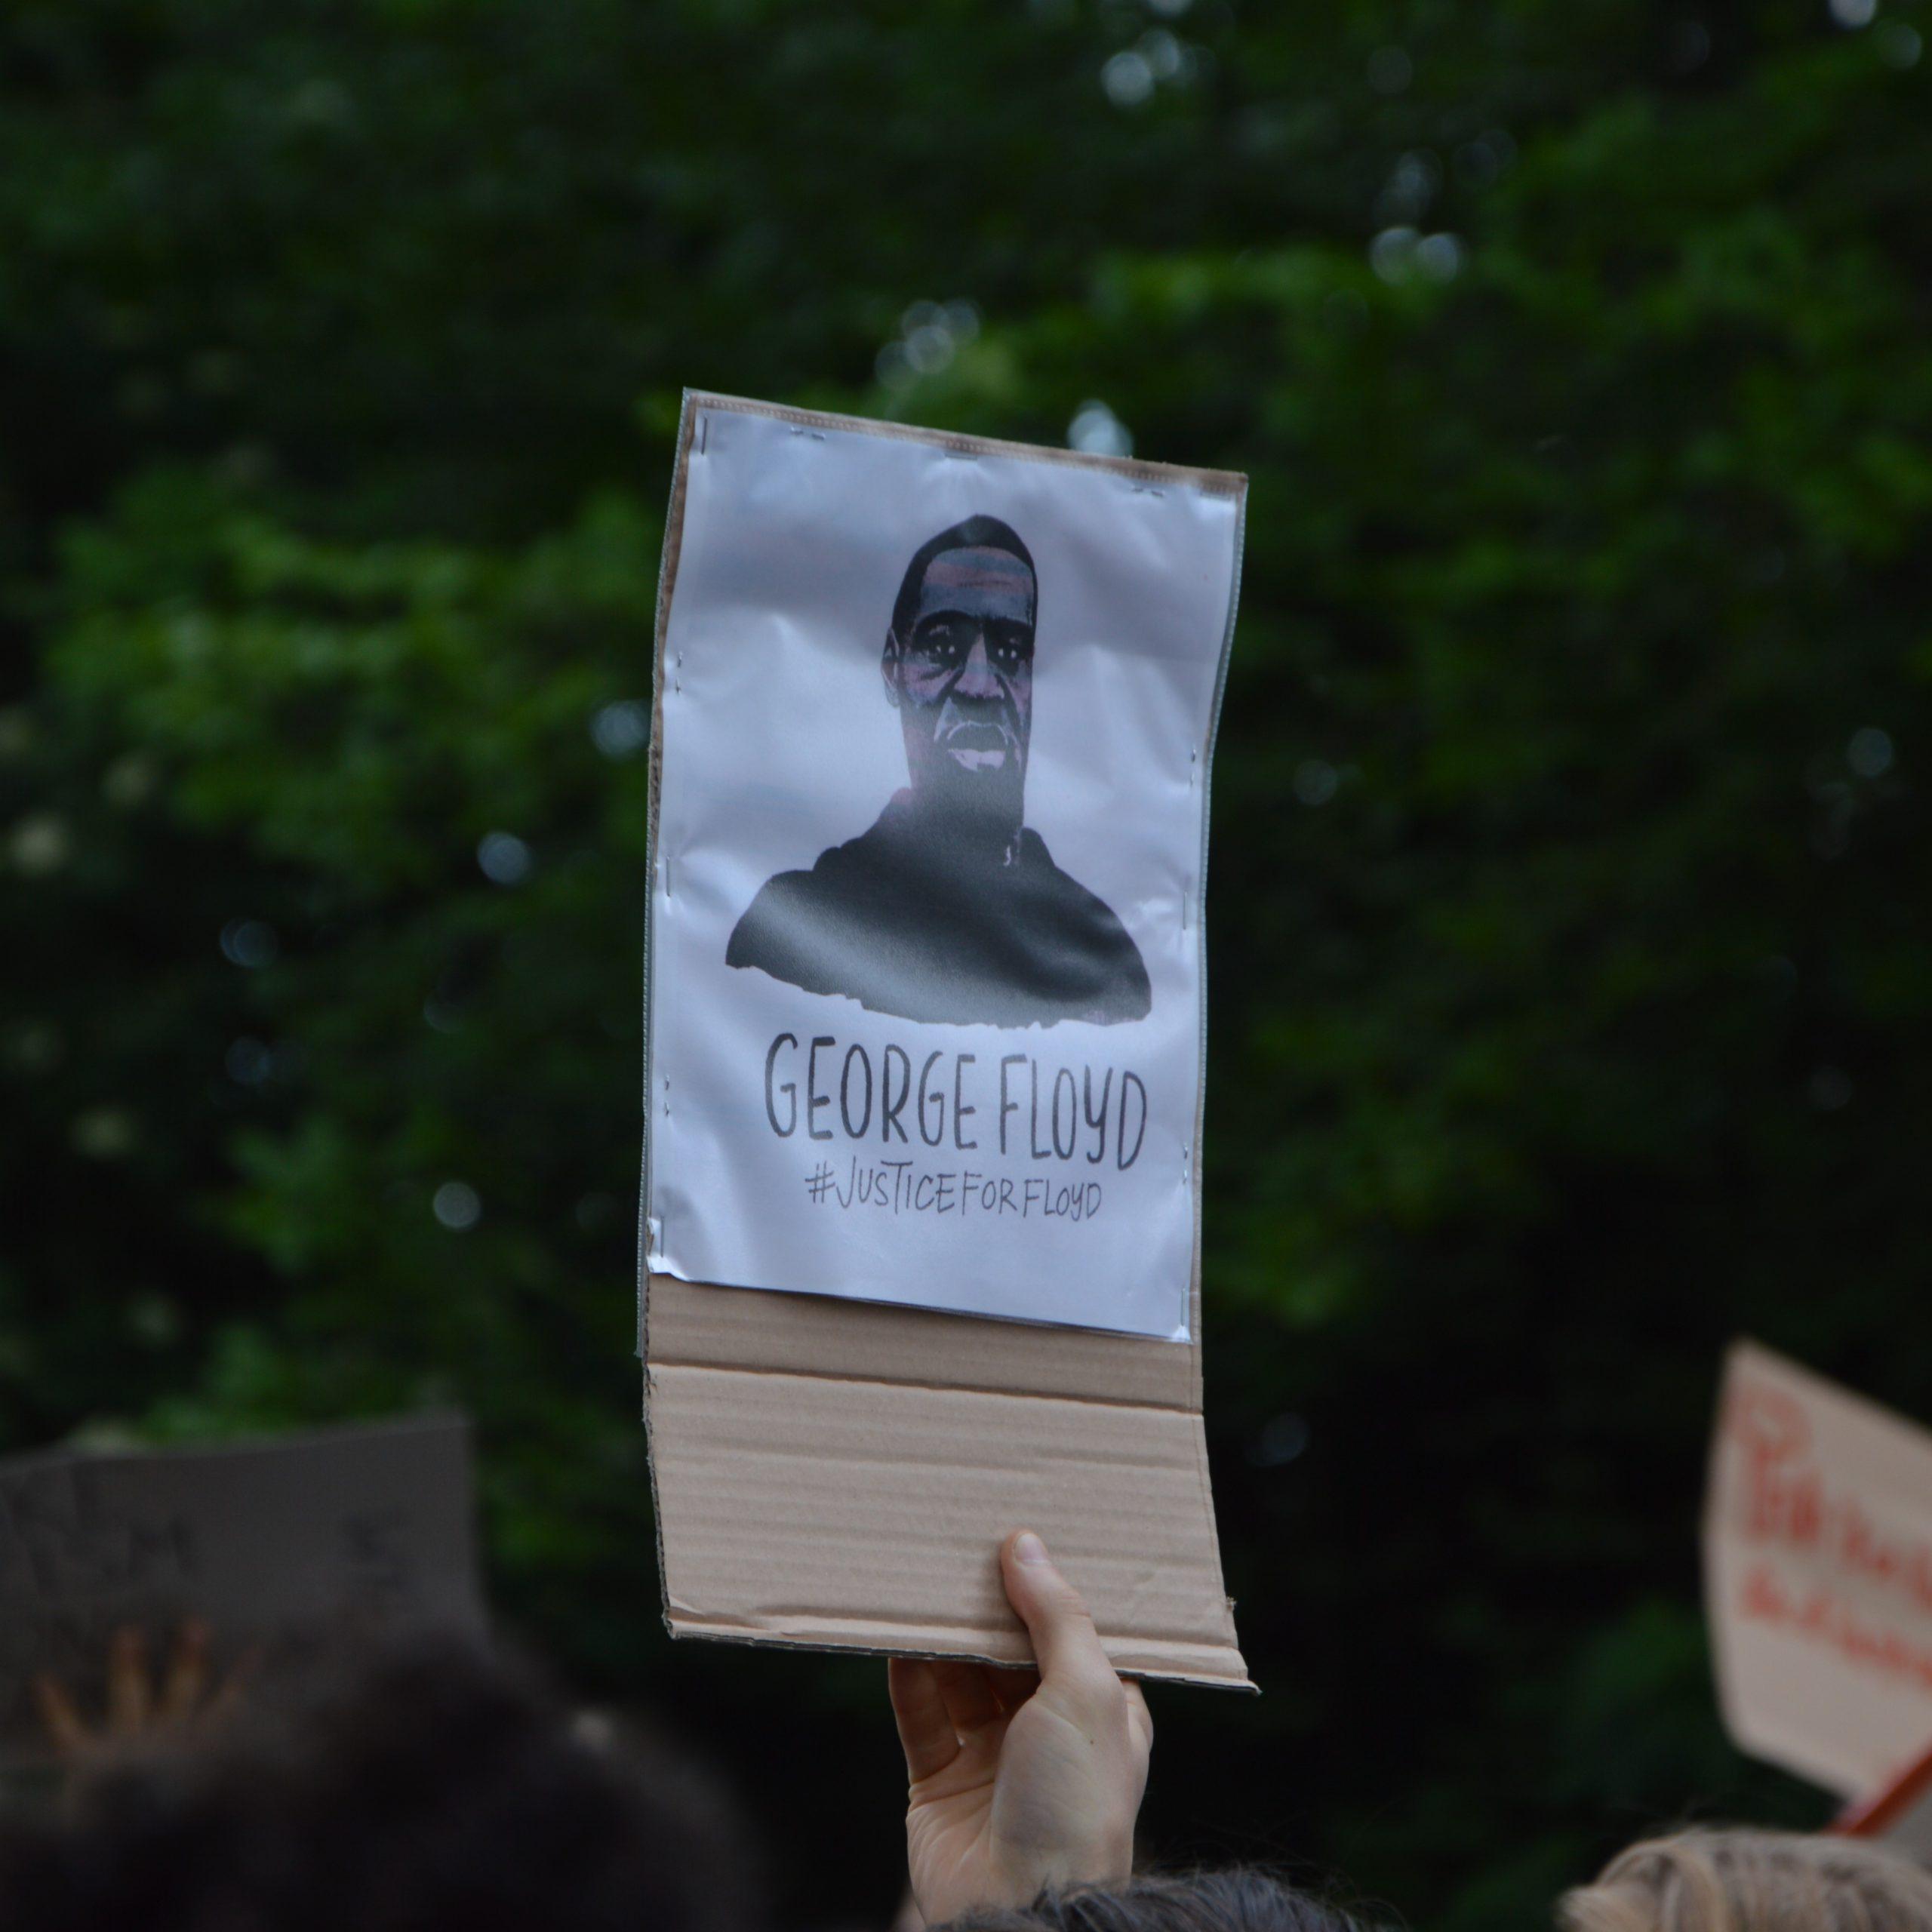 Demo George Floyd Plakat eines Demonstranten